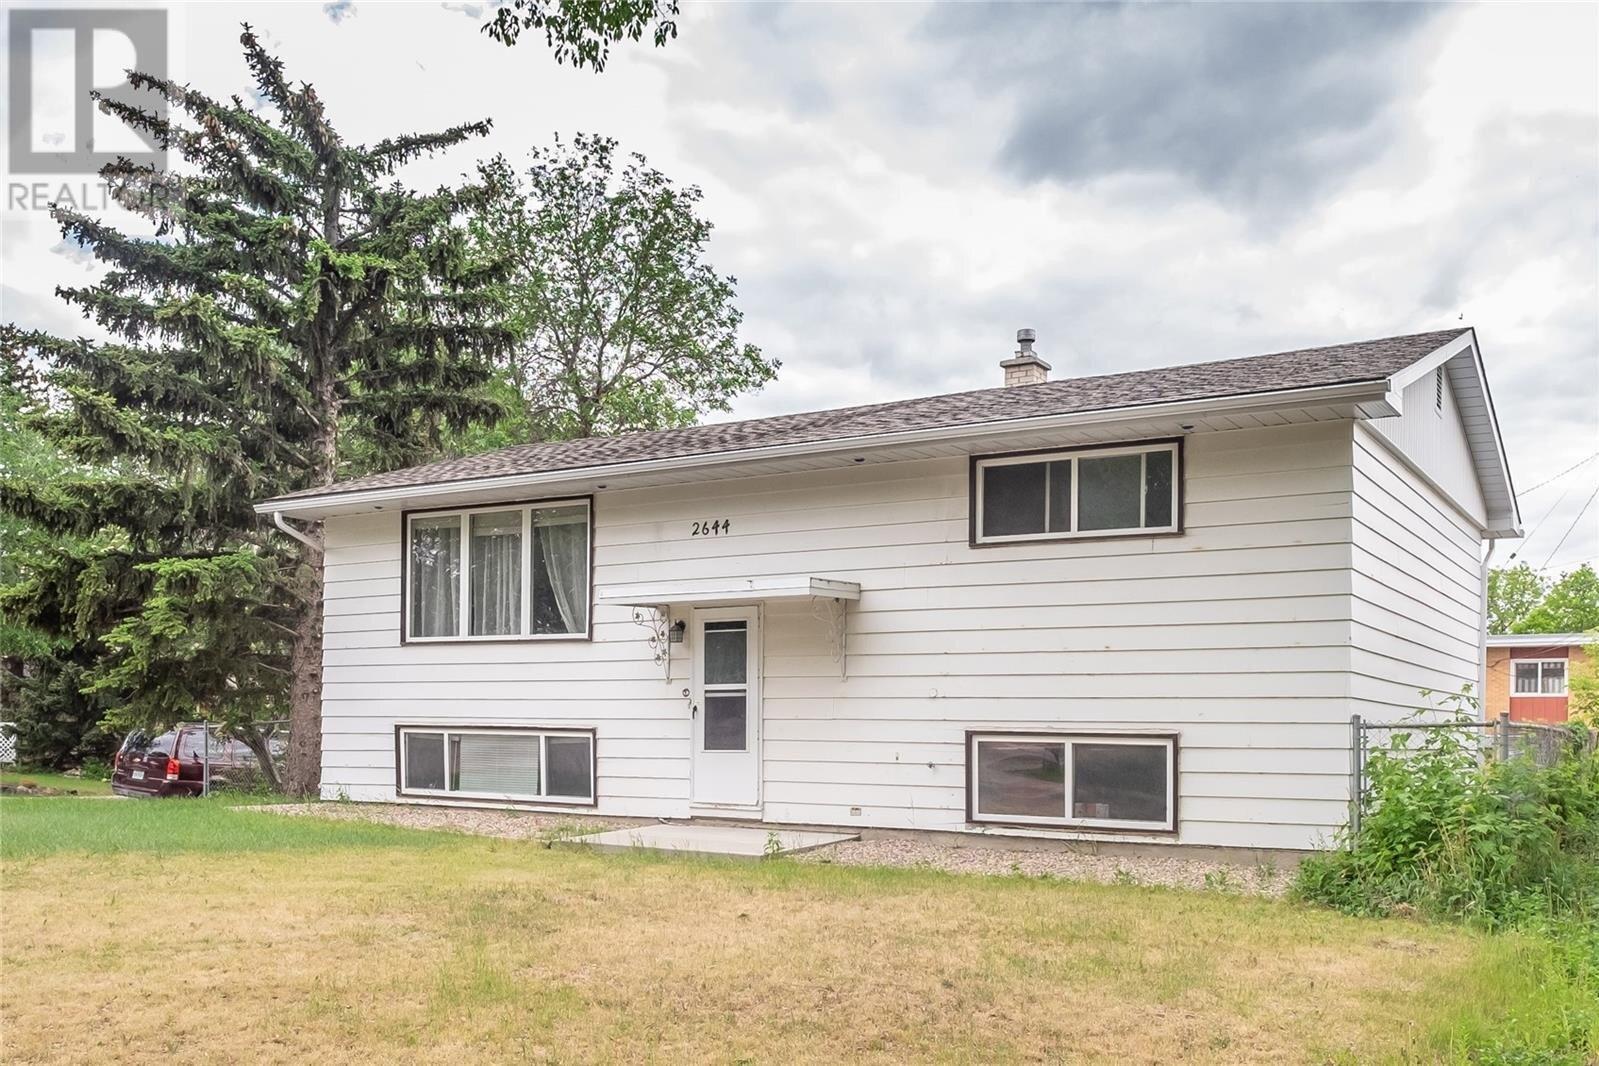 House for sale at 2644 Dominion Rd Regina Saskatchewan - MLS: SK831533